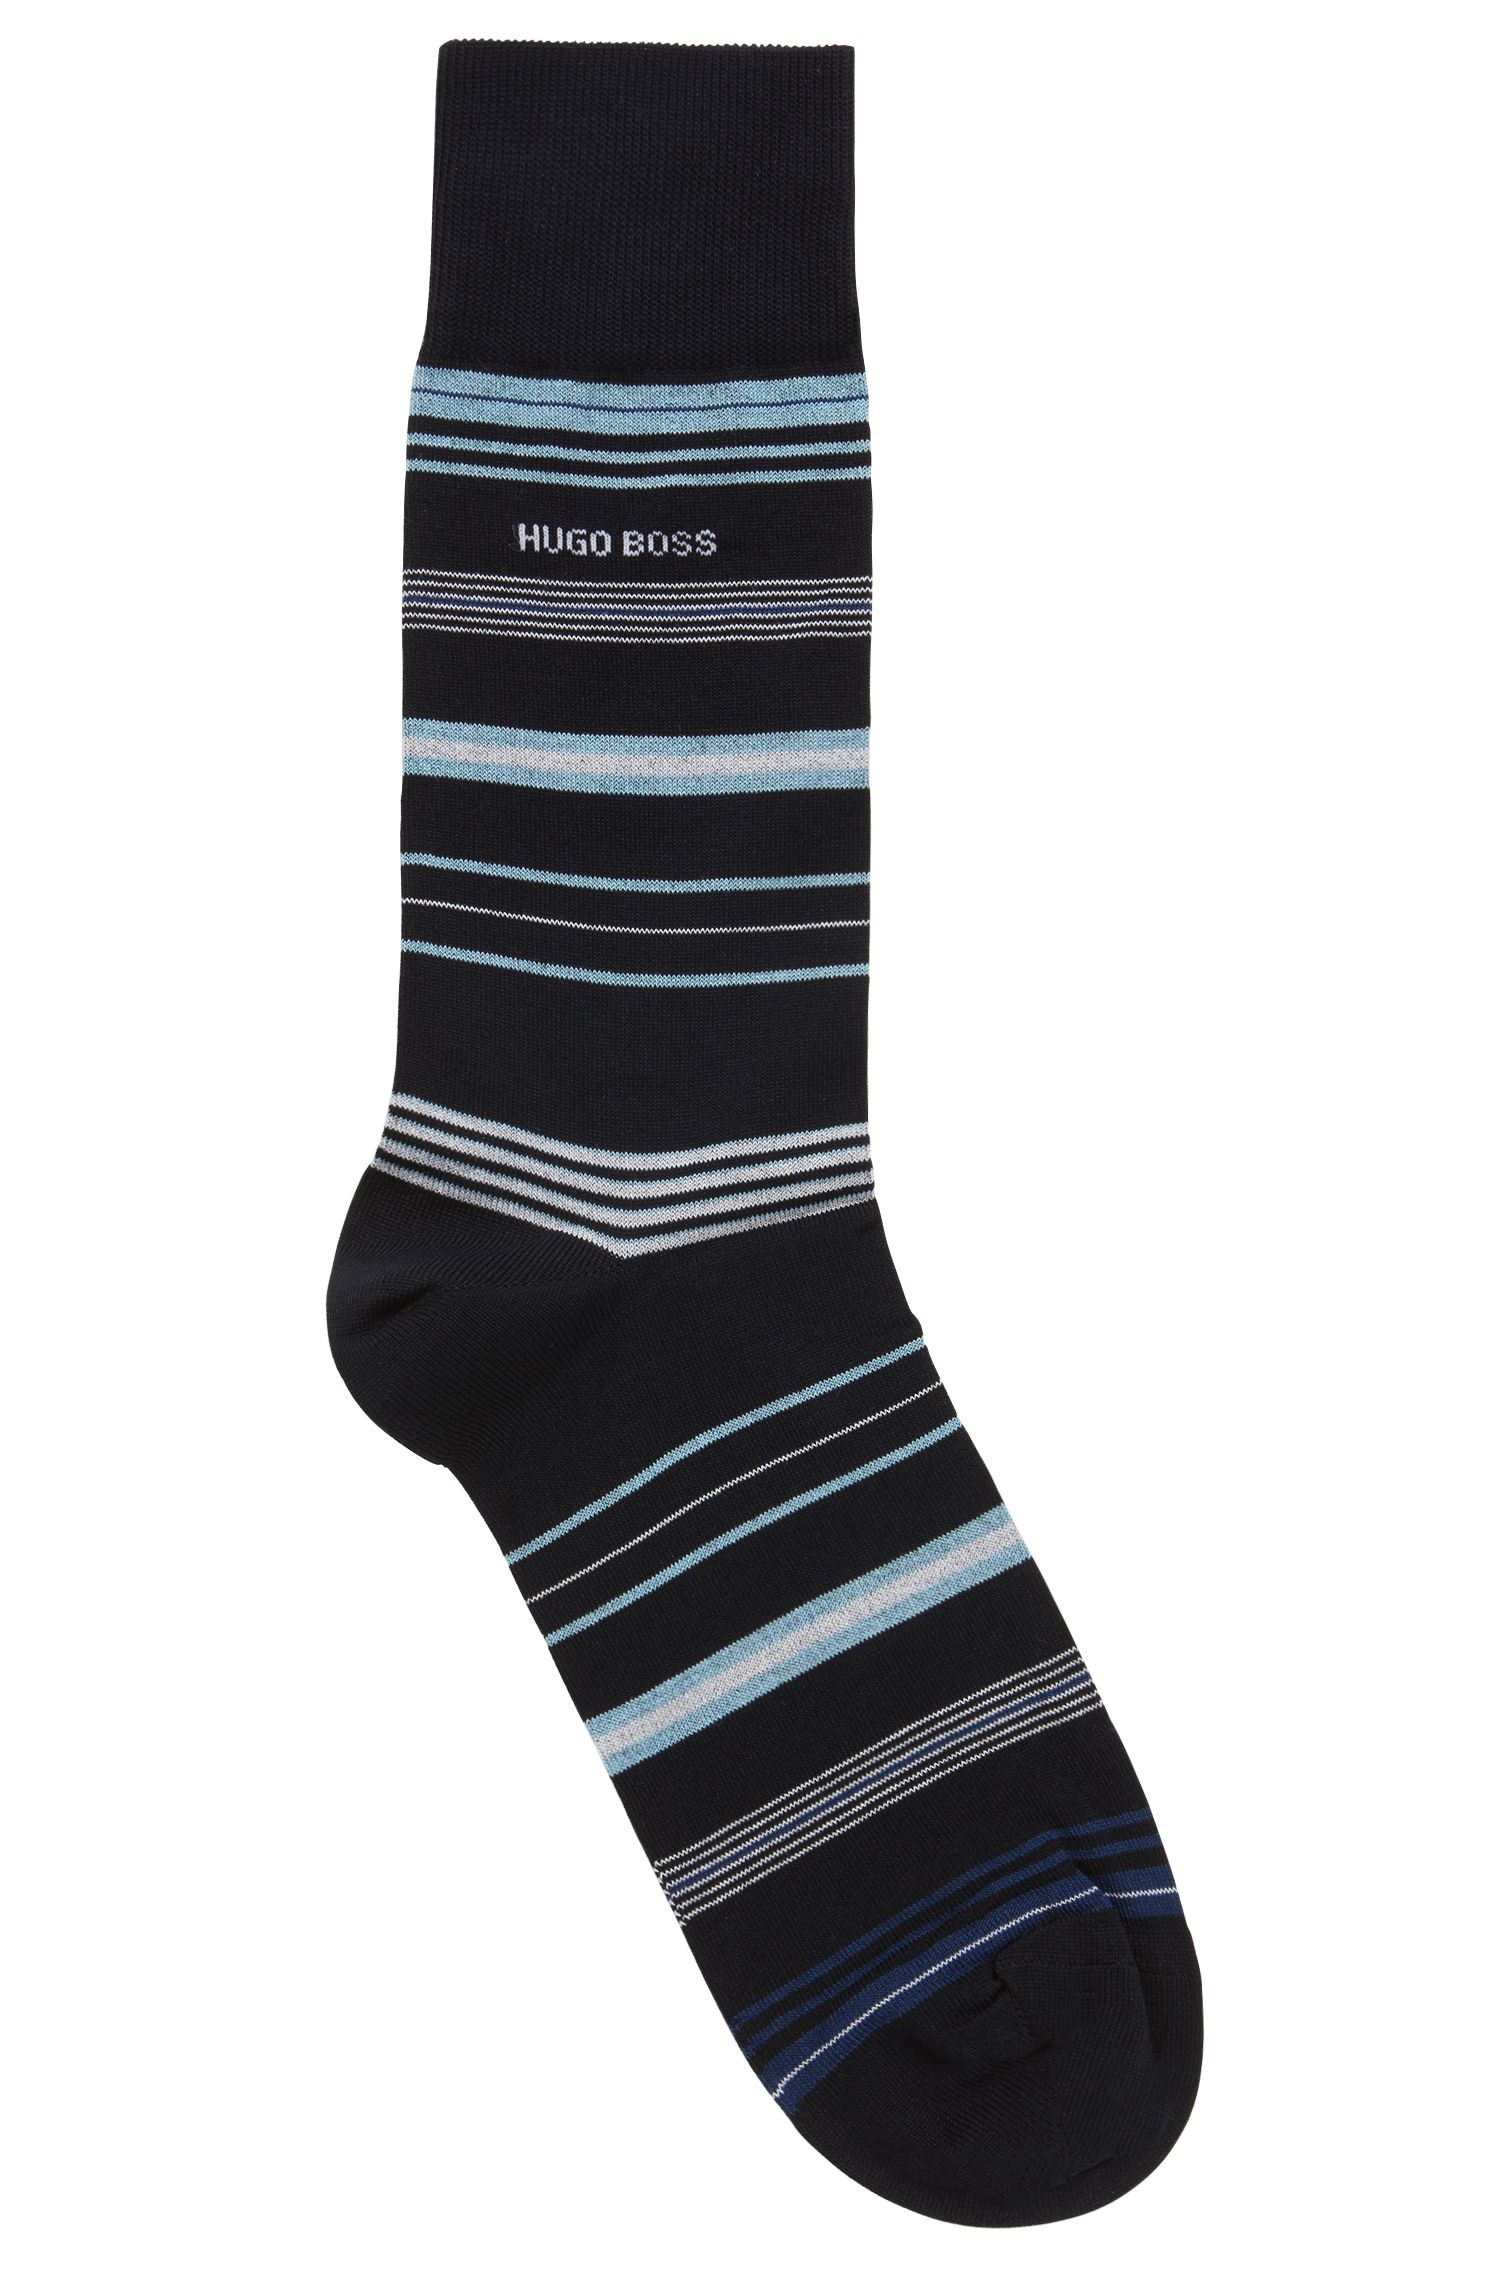 Calcetines a rayas en mezcla de algodón elástico mercerizado, Azul oscuro